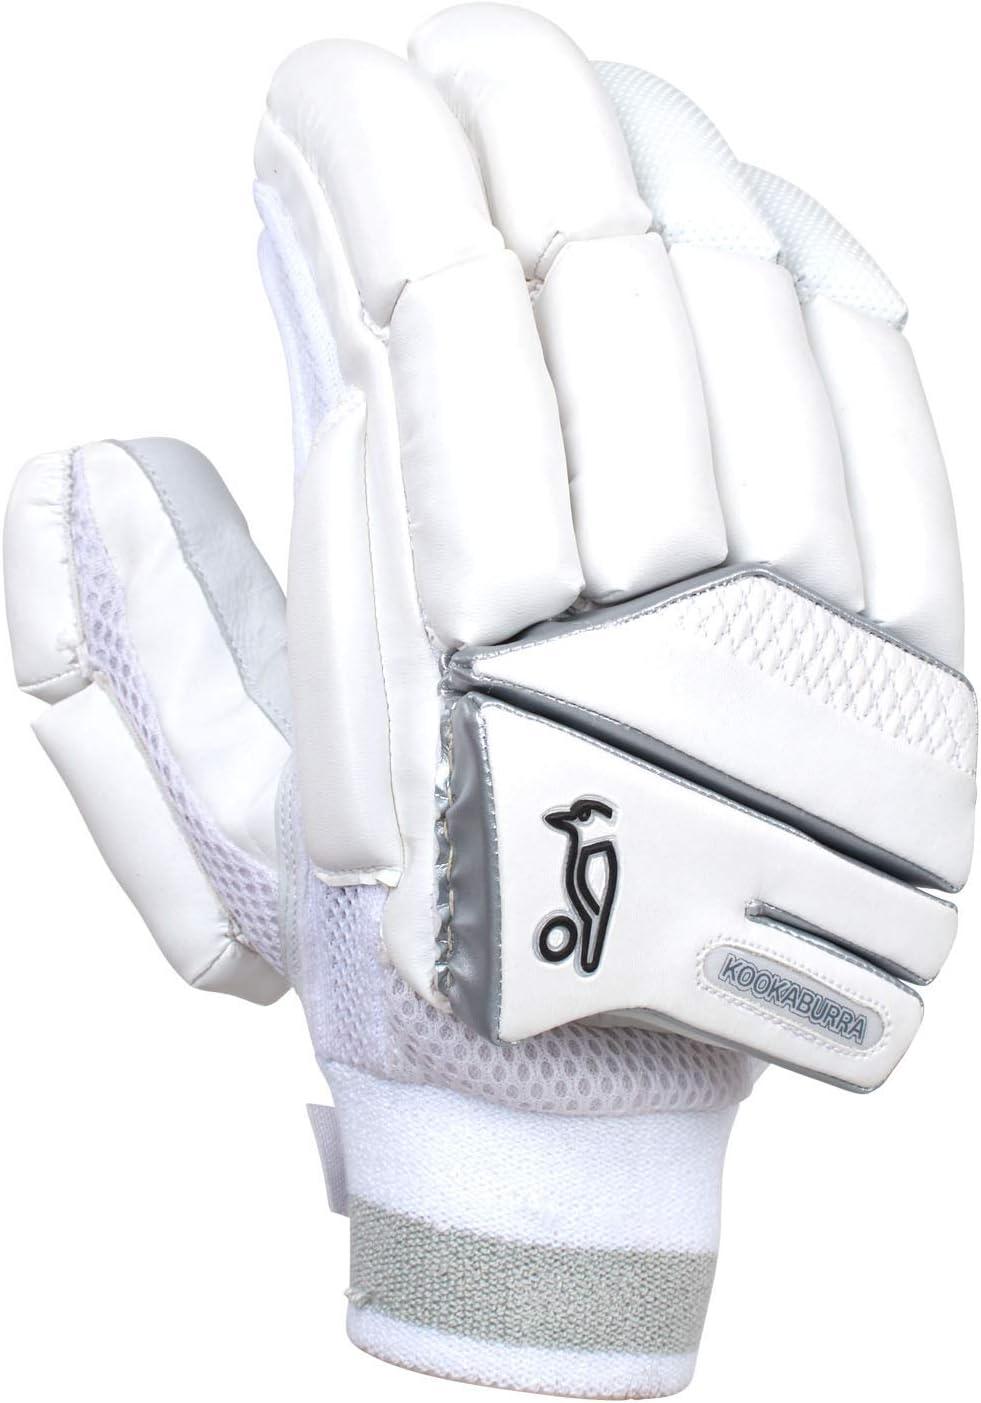 Kookaburra Ghost 3.0 Batting Gloves